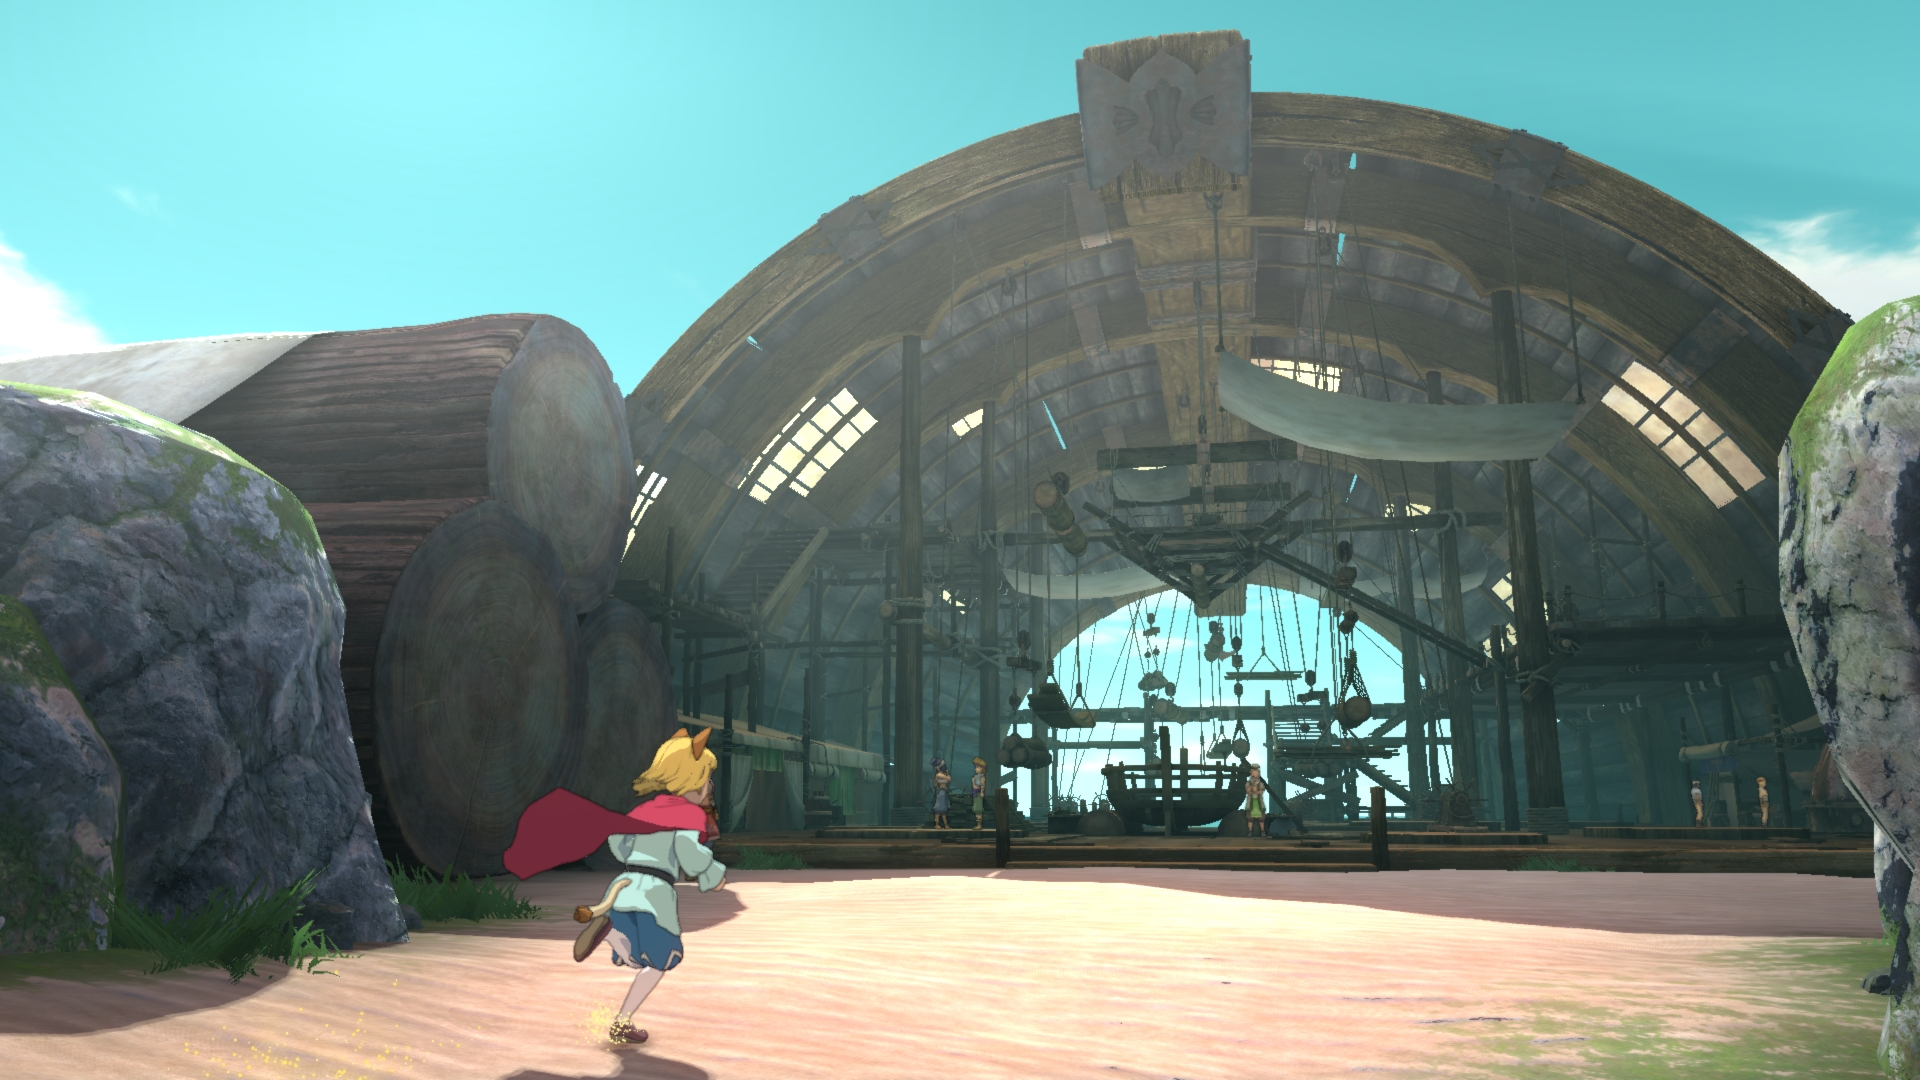 Ni no Kuni II: Revenant Kingdom v traileru a na screenshotech pro letošní Gamescom 148571